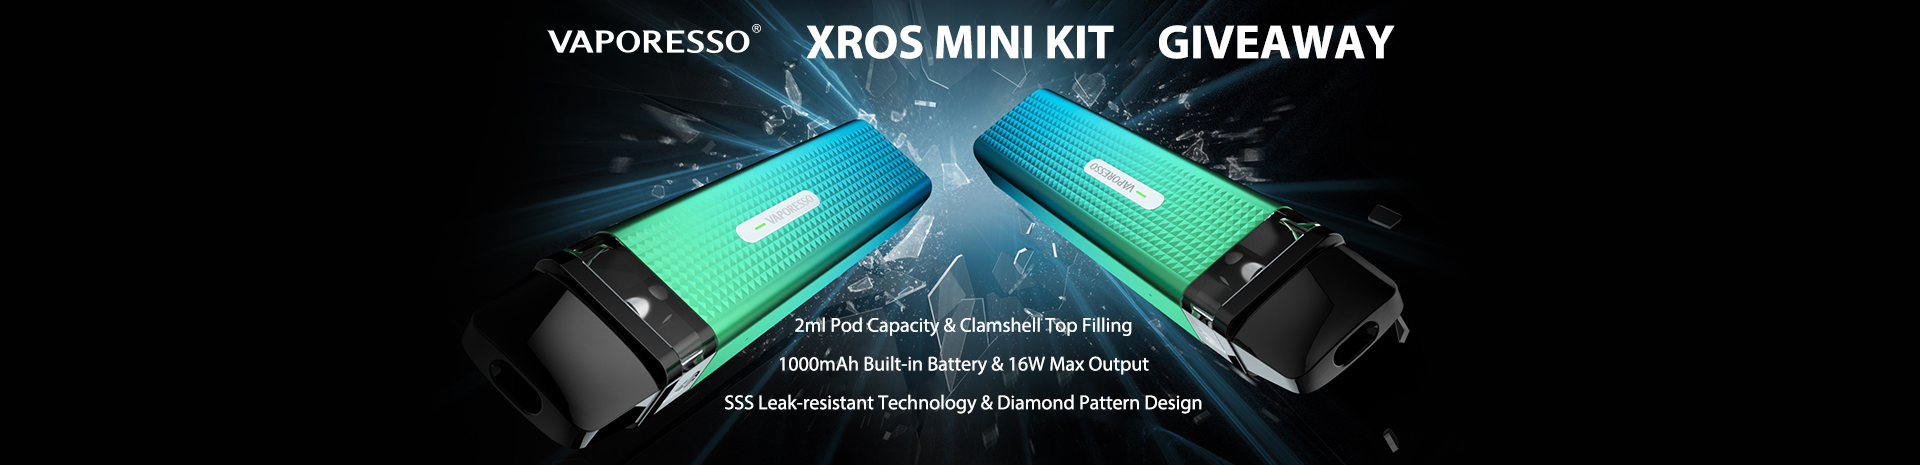 Vaporesso XROS Mini Kit Giveaway Banner